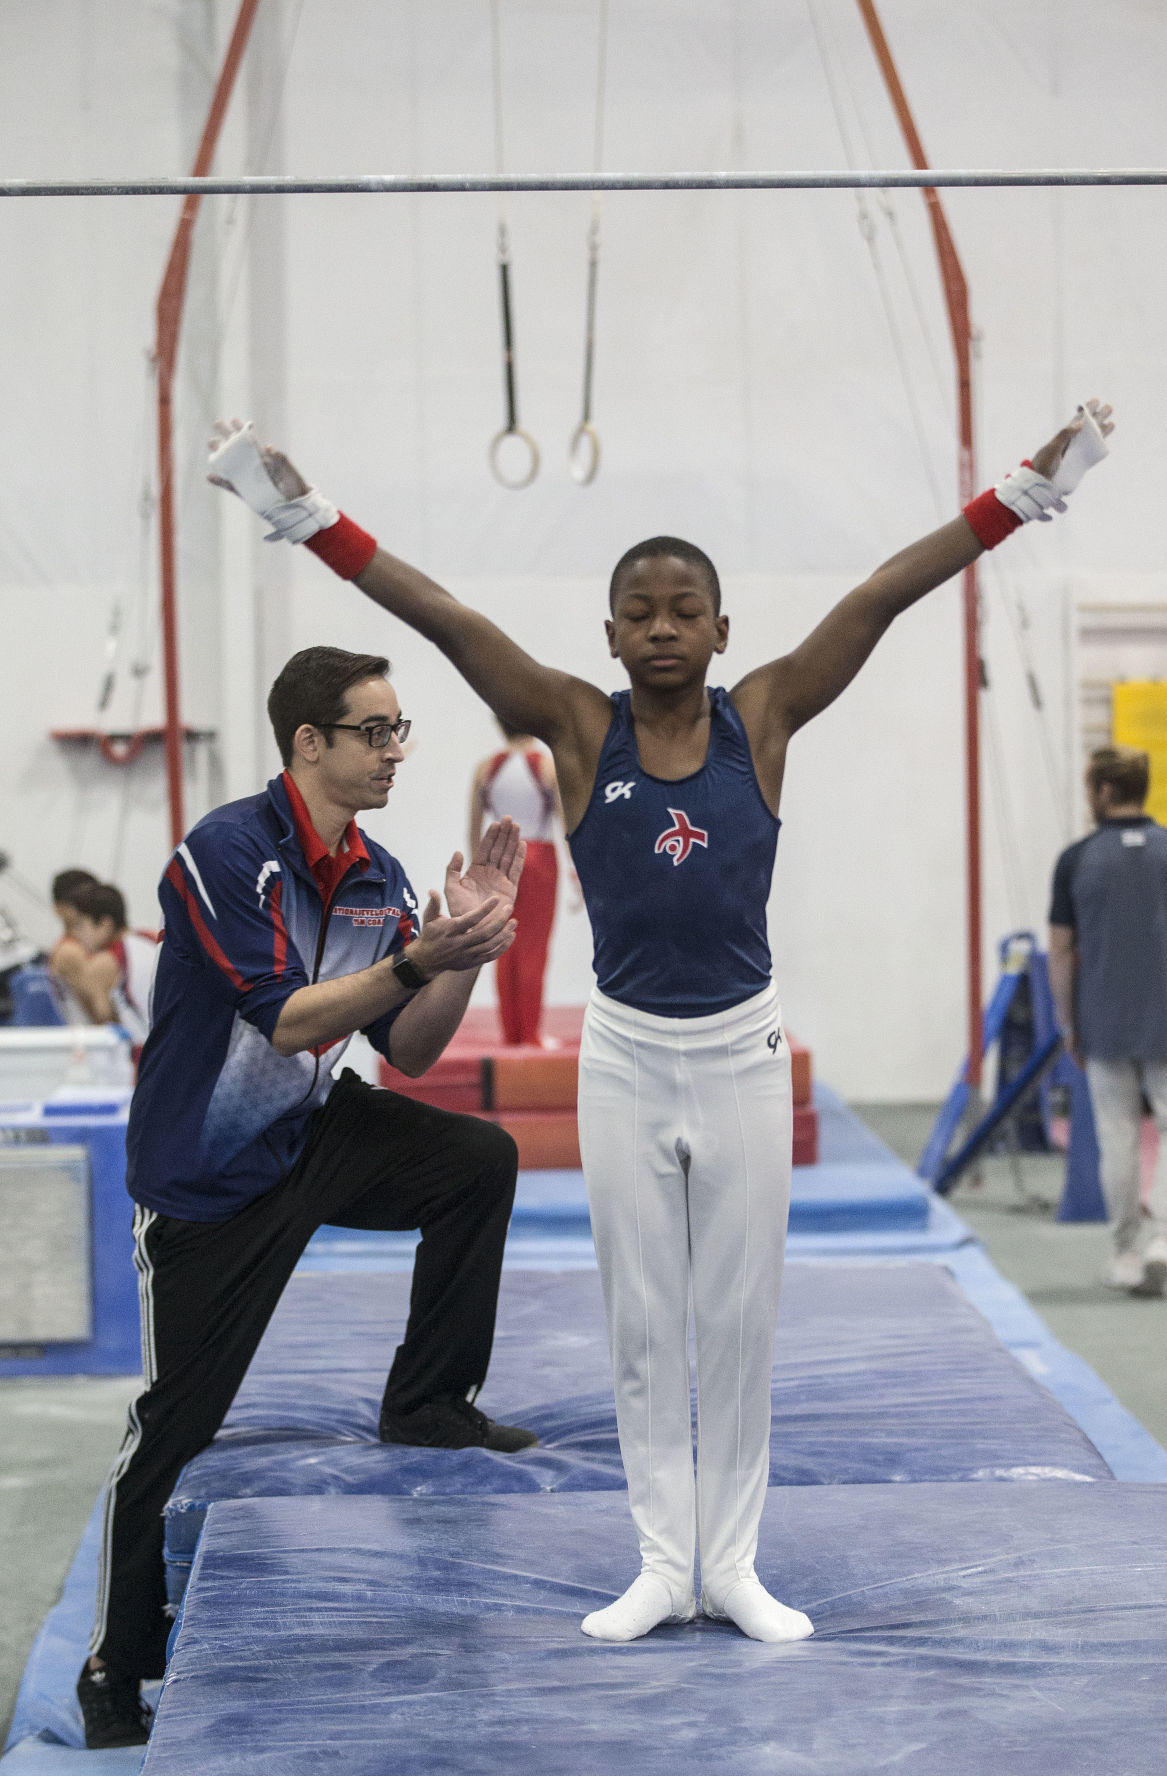 Highlanders shine at Team Gymnastics competitions